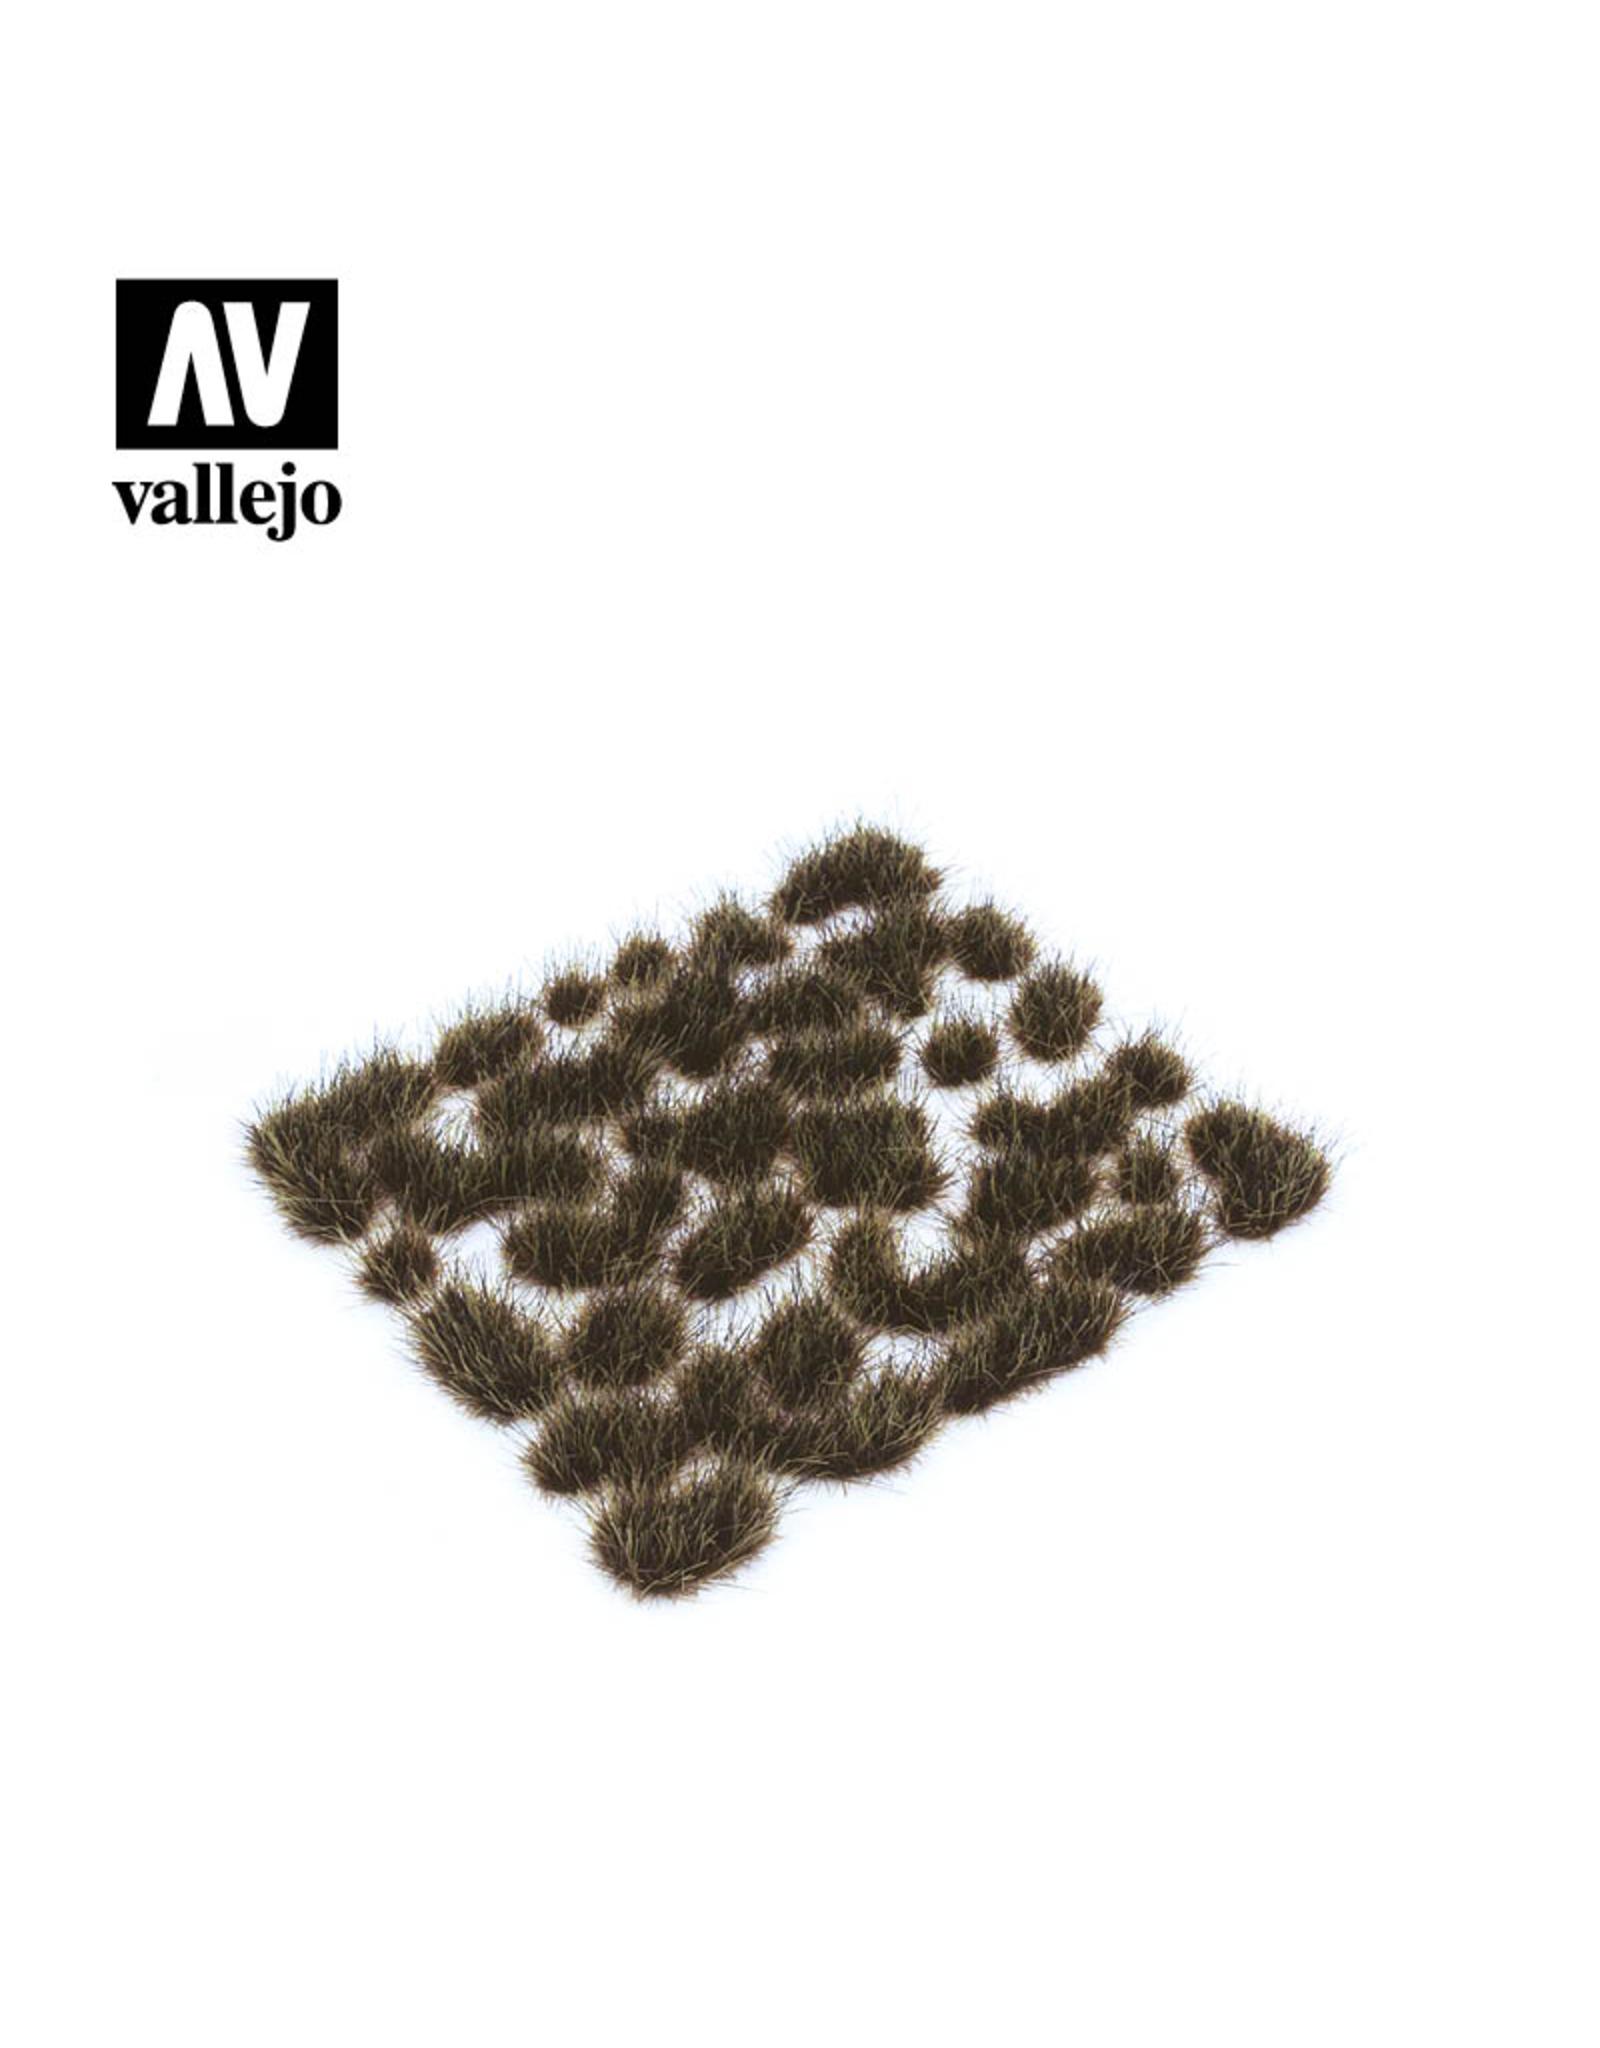 Vallejo Wild tuft - Burned (6mm)